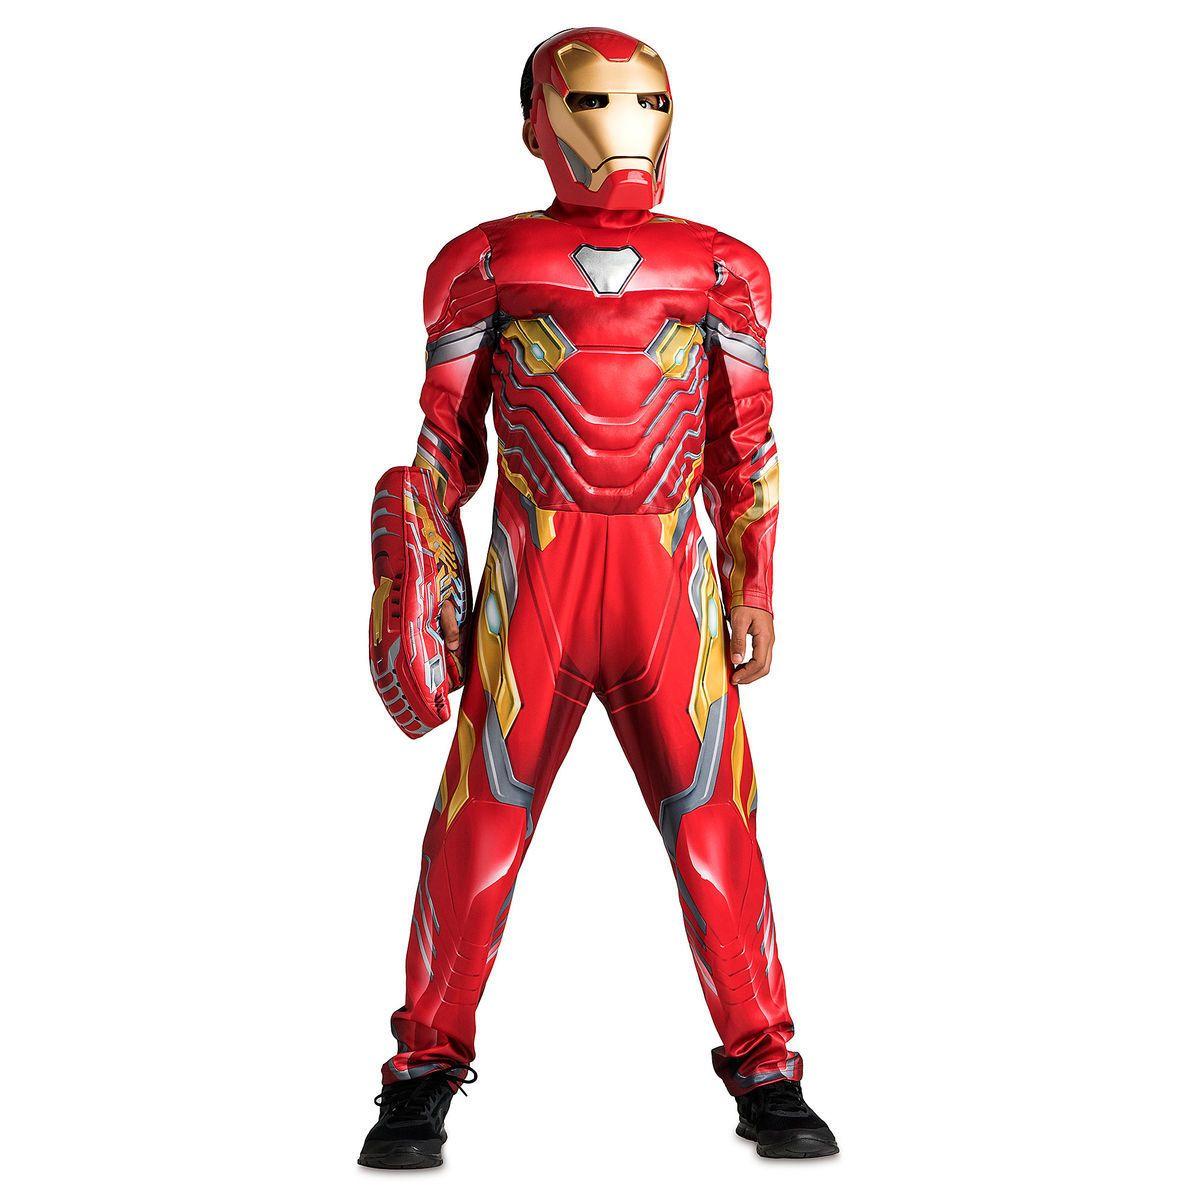 Ironman Costume Cape and Mask Set Kids Marvel Comics Superhero Dress Up